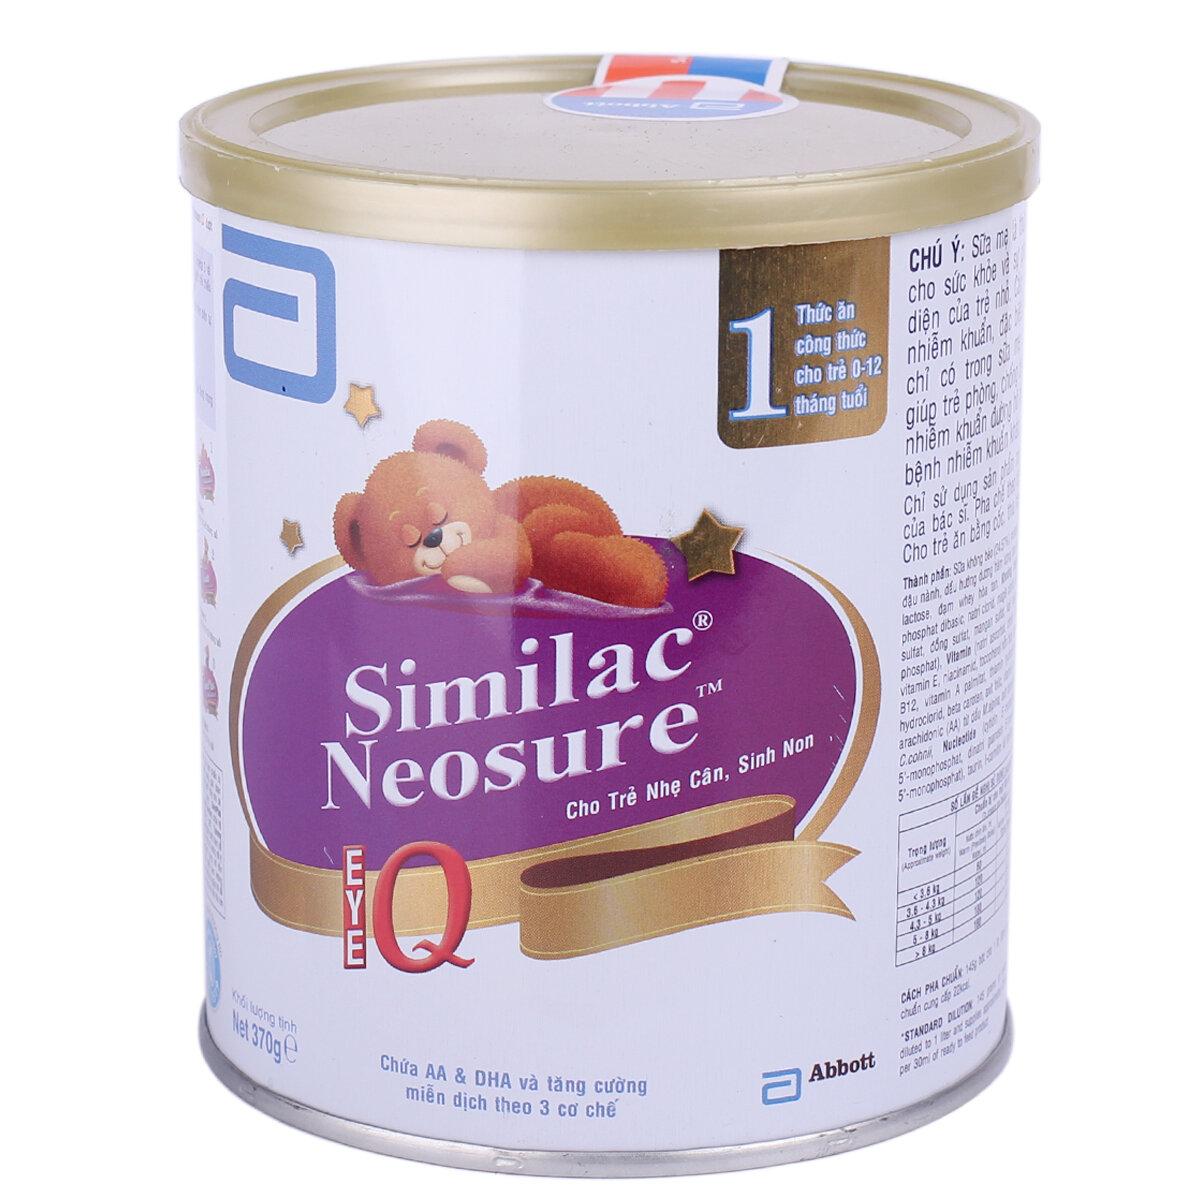 Bổ sung sữa Similac Neosure cho bé vừa ốm dậy